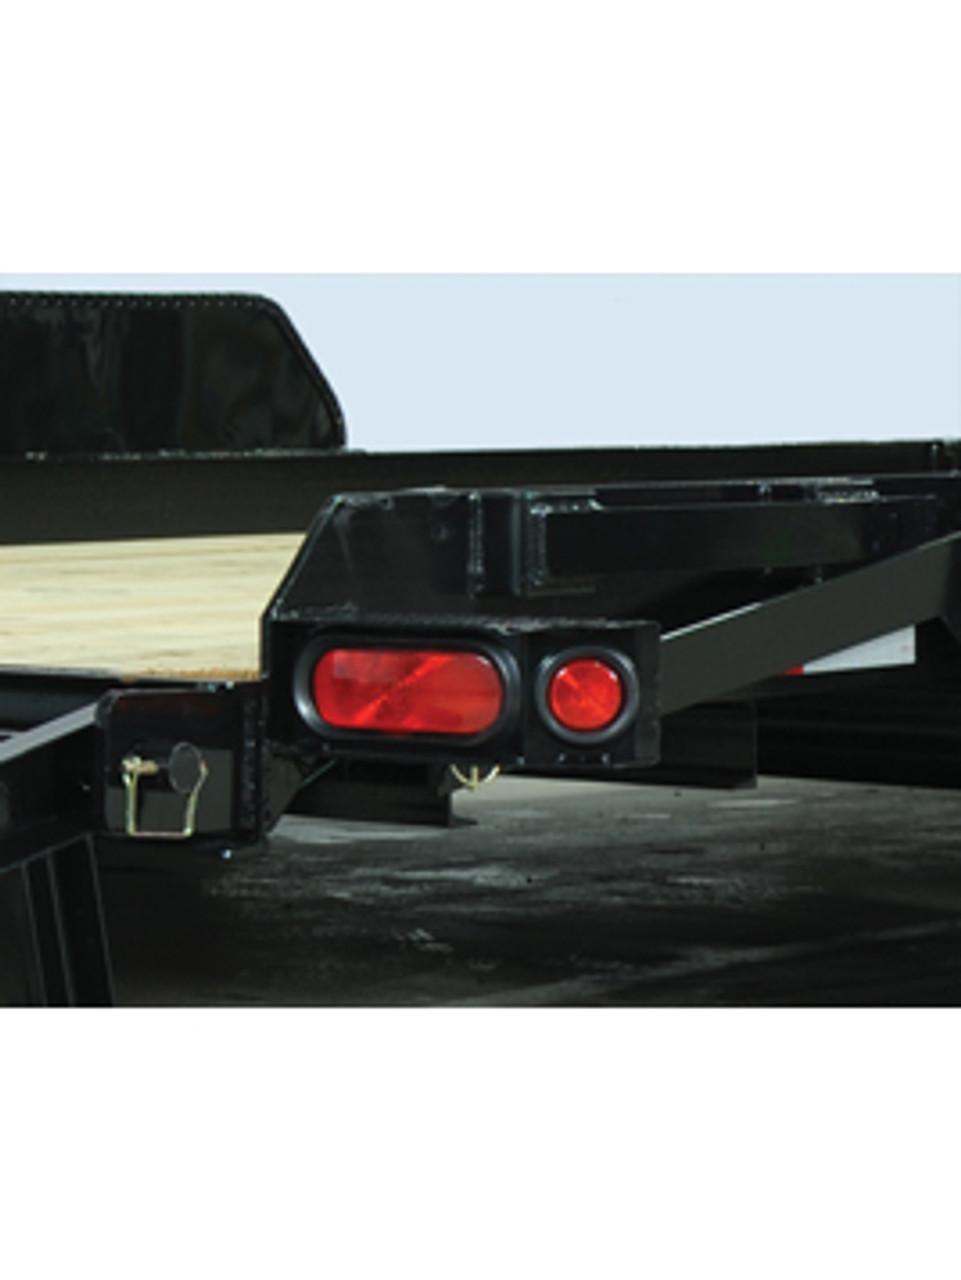 "STSK8020TA5 --- 79"" x 20' Low Profile Skid Steer Trailer"